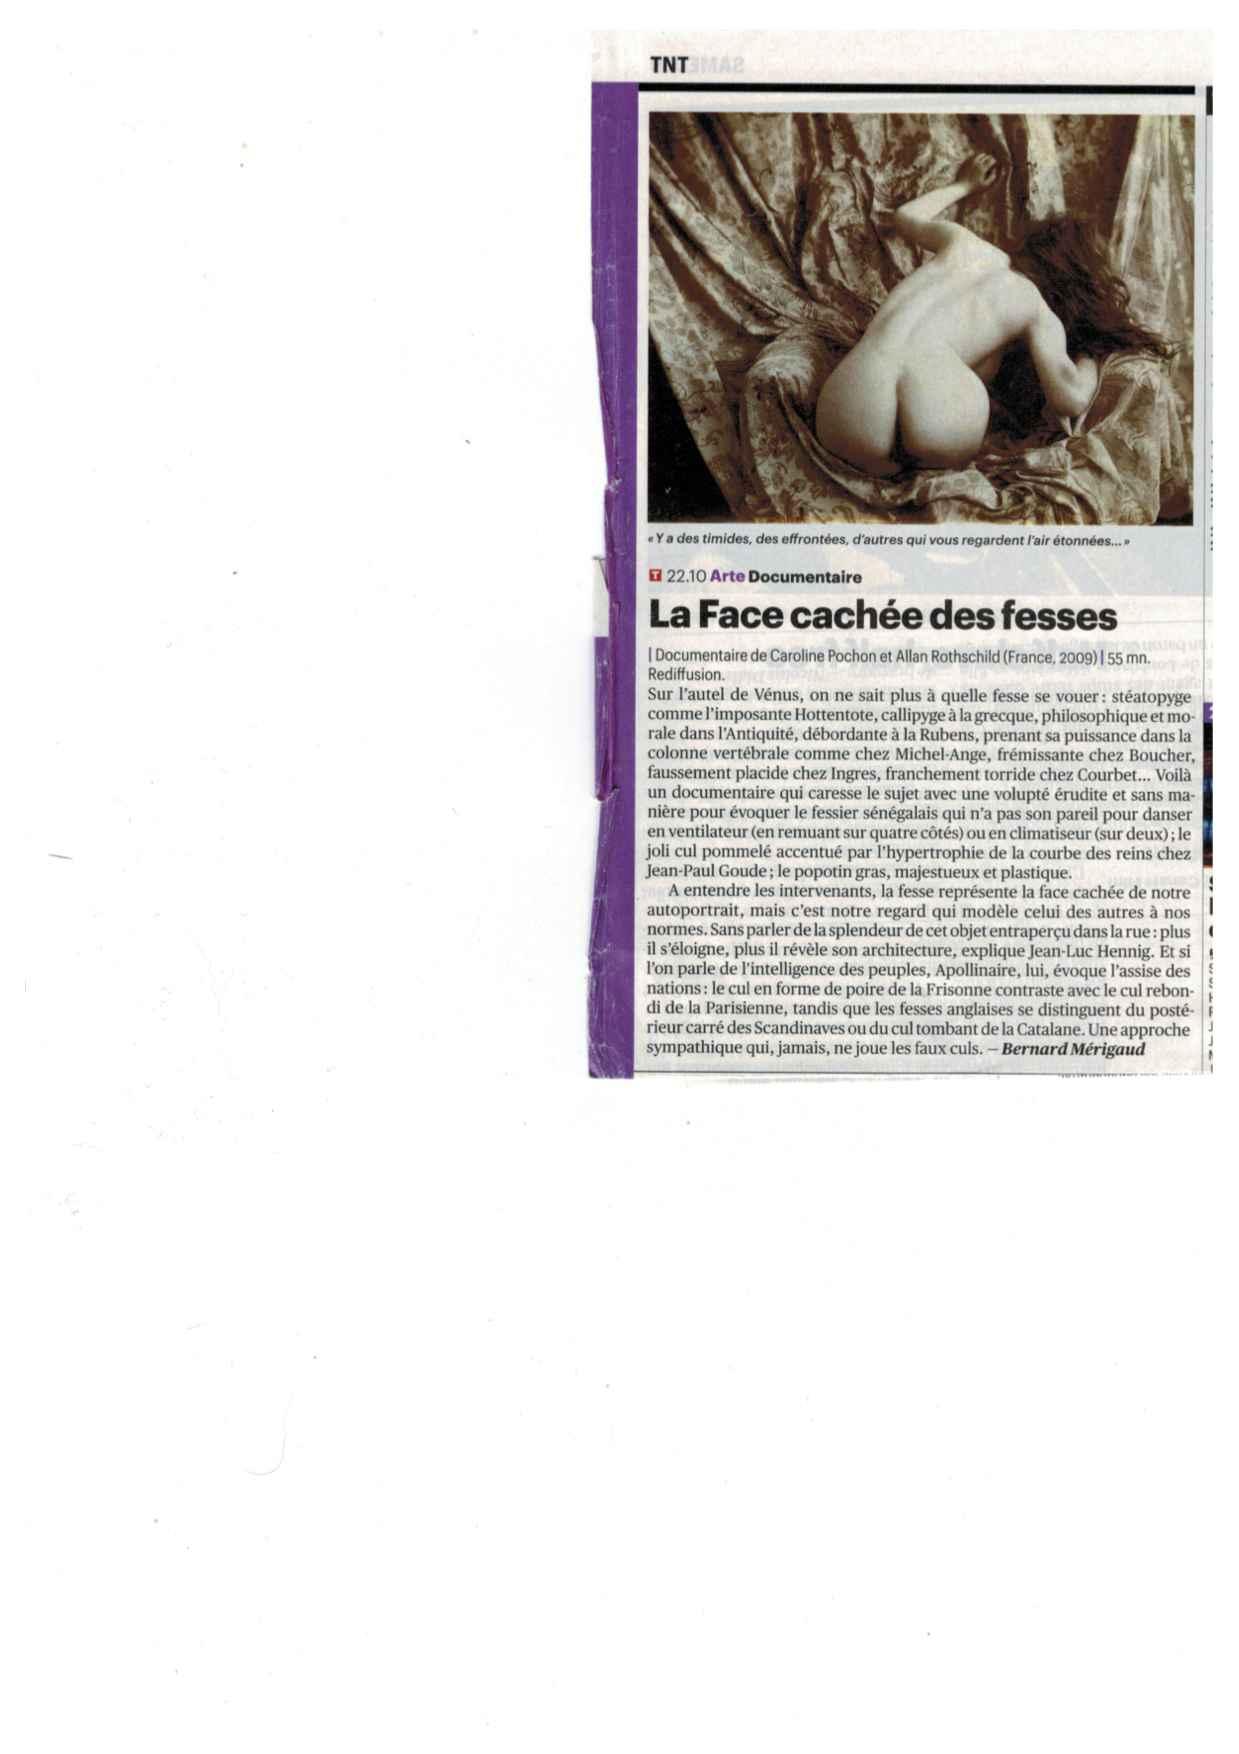 Article Télérama - Fesses rediff mai 2015